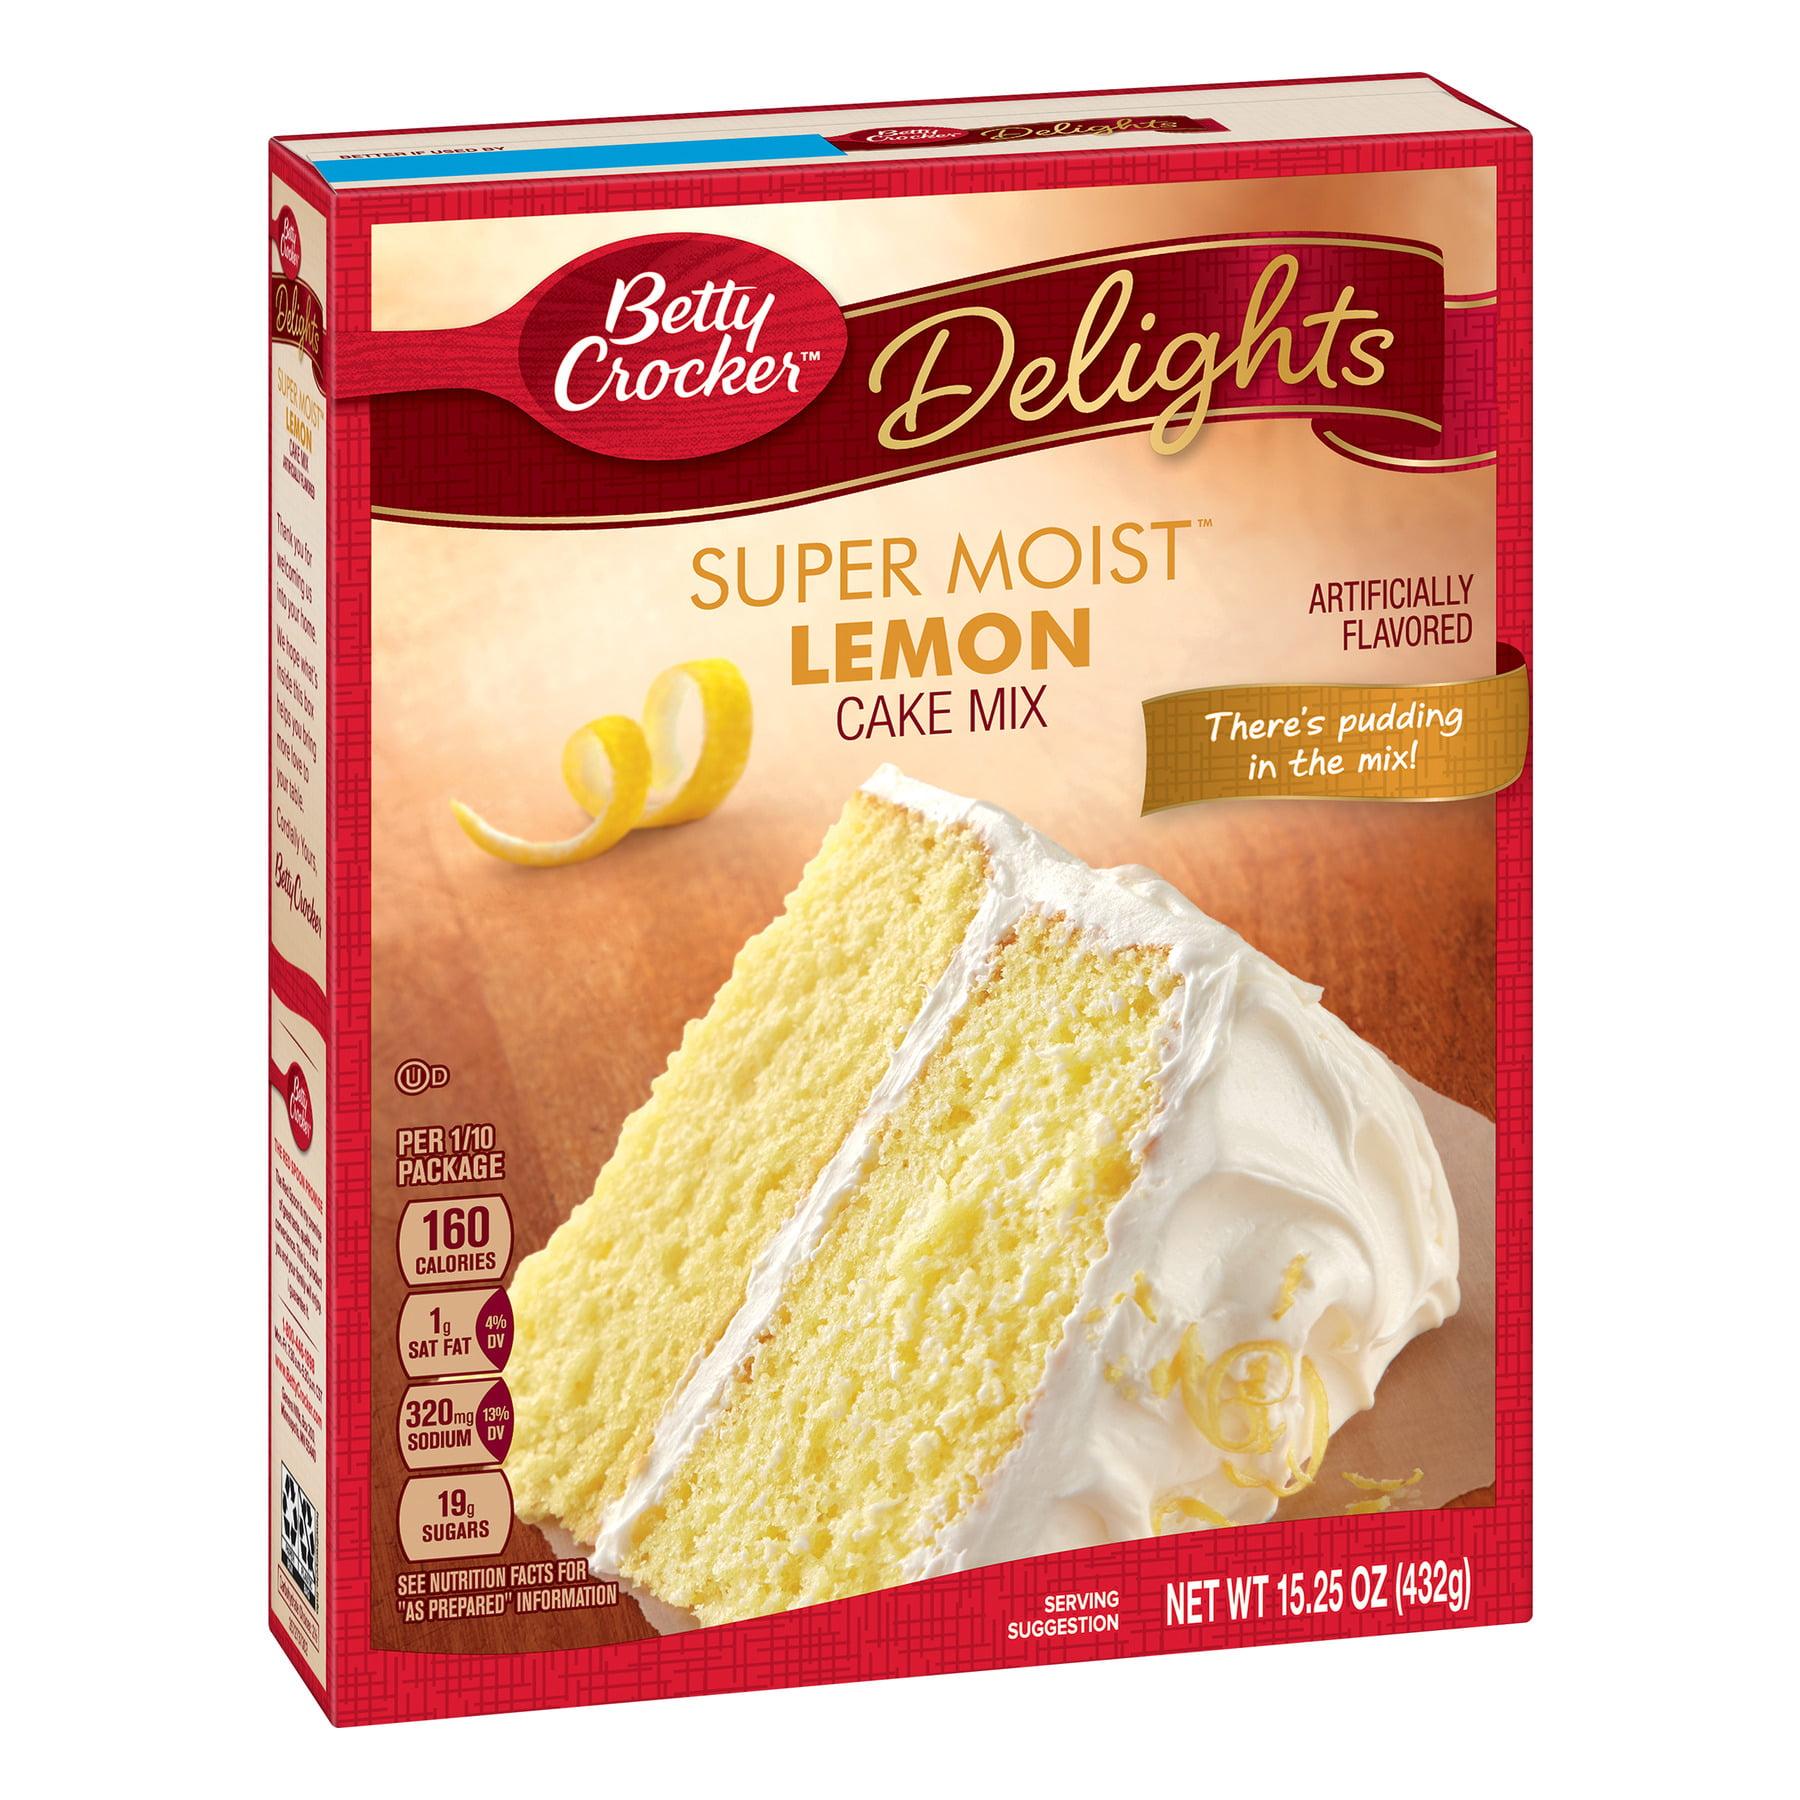 Betty Crocker Baking Mix, Super Moist Cake Mix, Lemon, 15.25 Oz Box ...